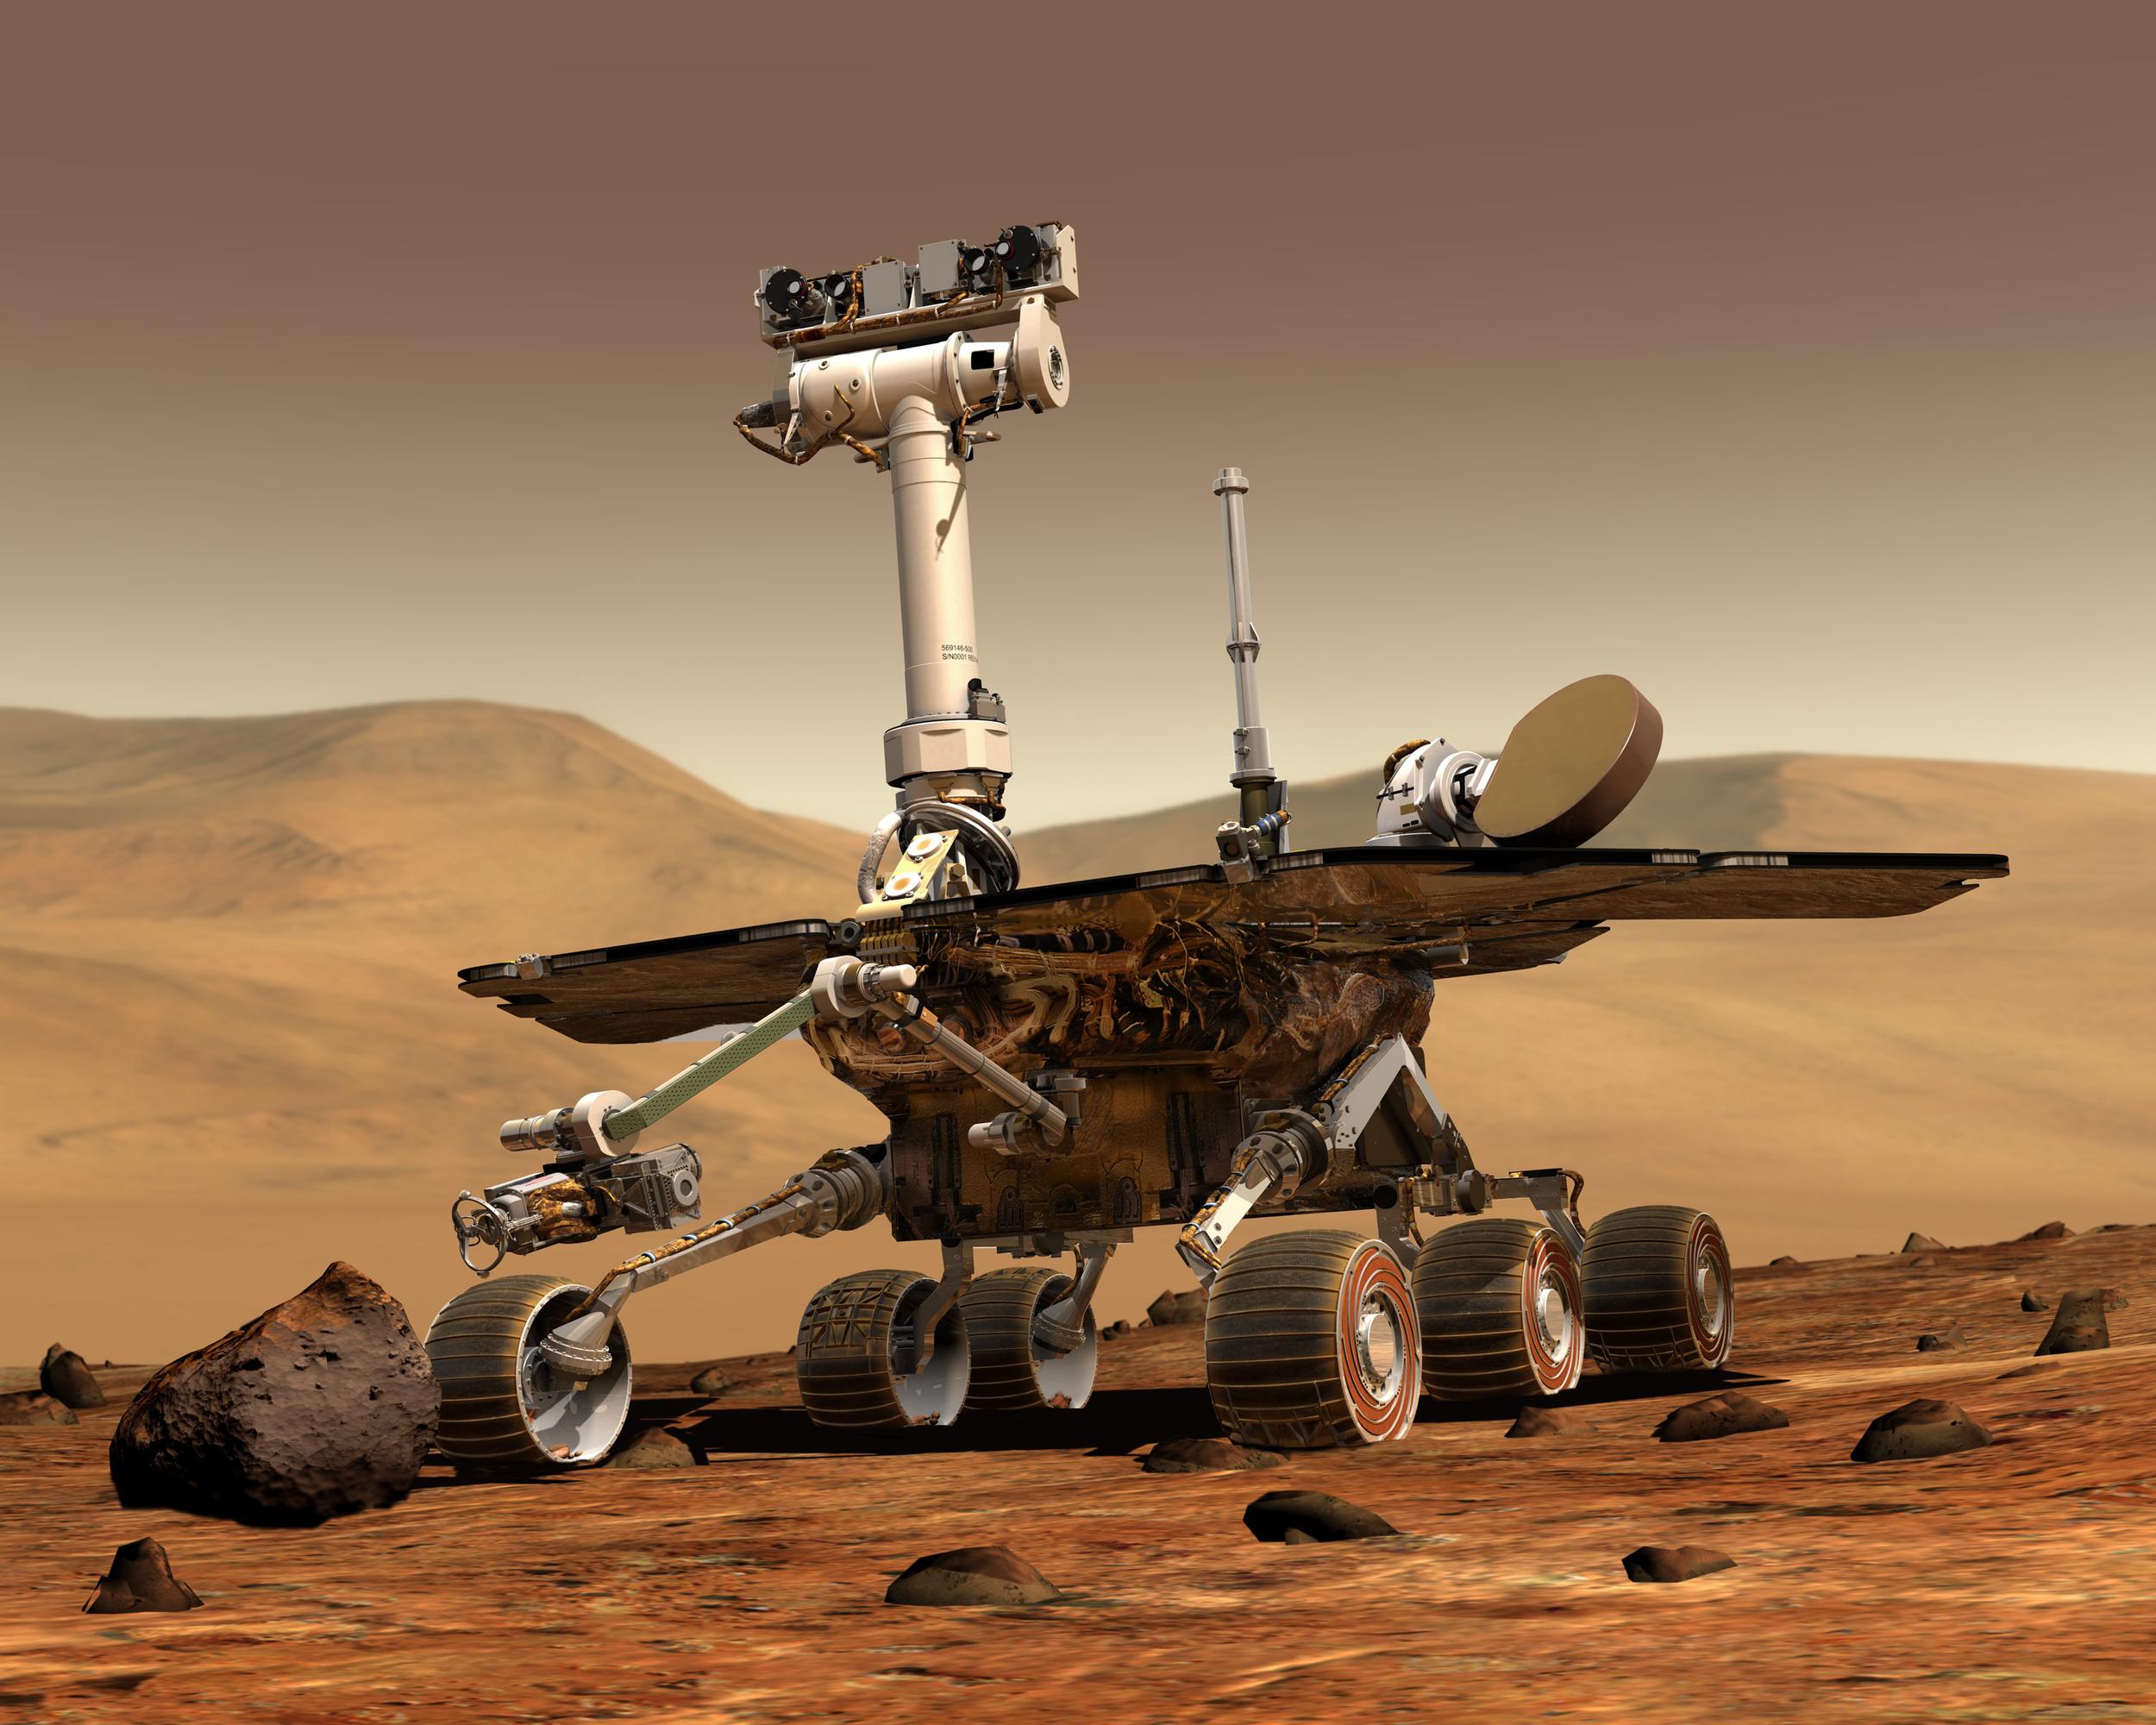 Image Credit: NASA/JPL/Cornell University, Maas Digital LLC